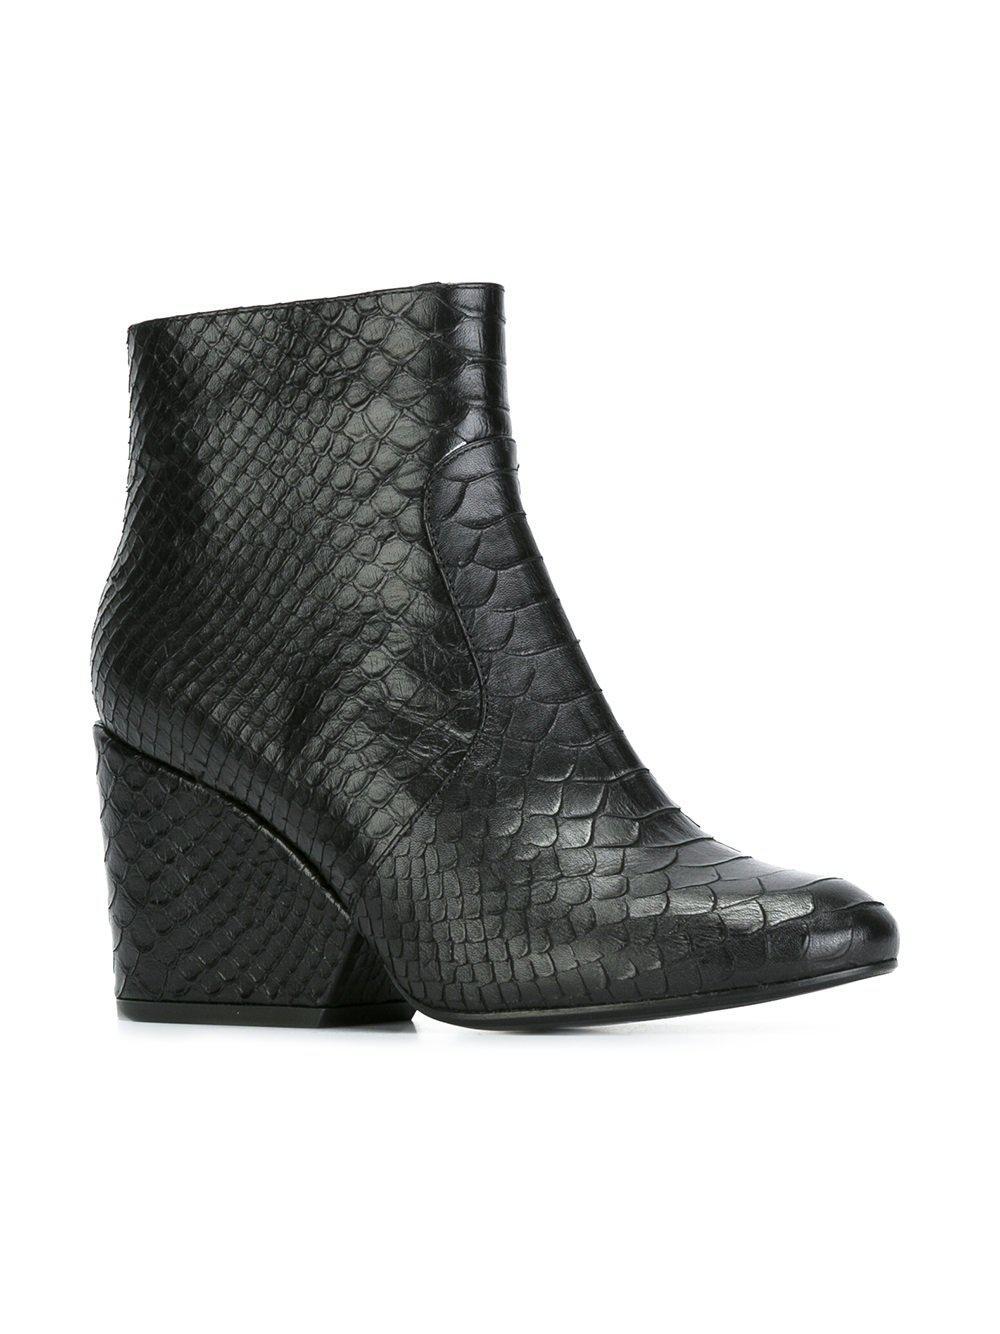 Robert Clergerie 'Toots 21' boots FyFOl